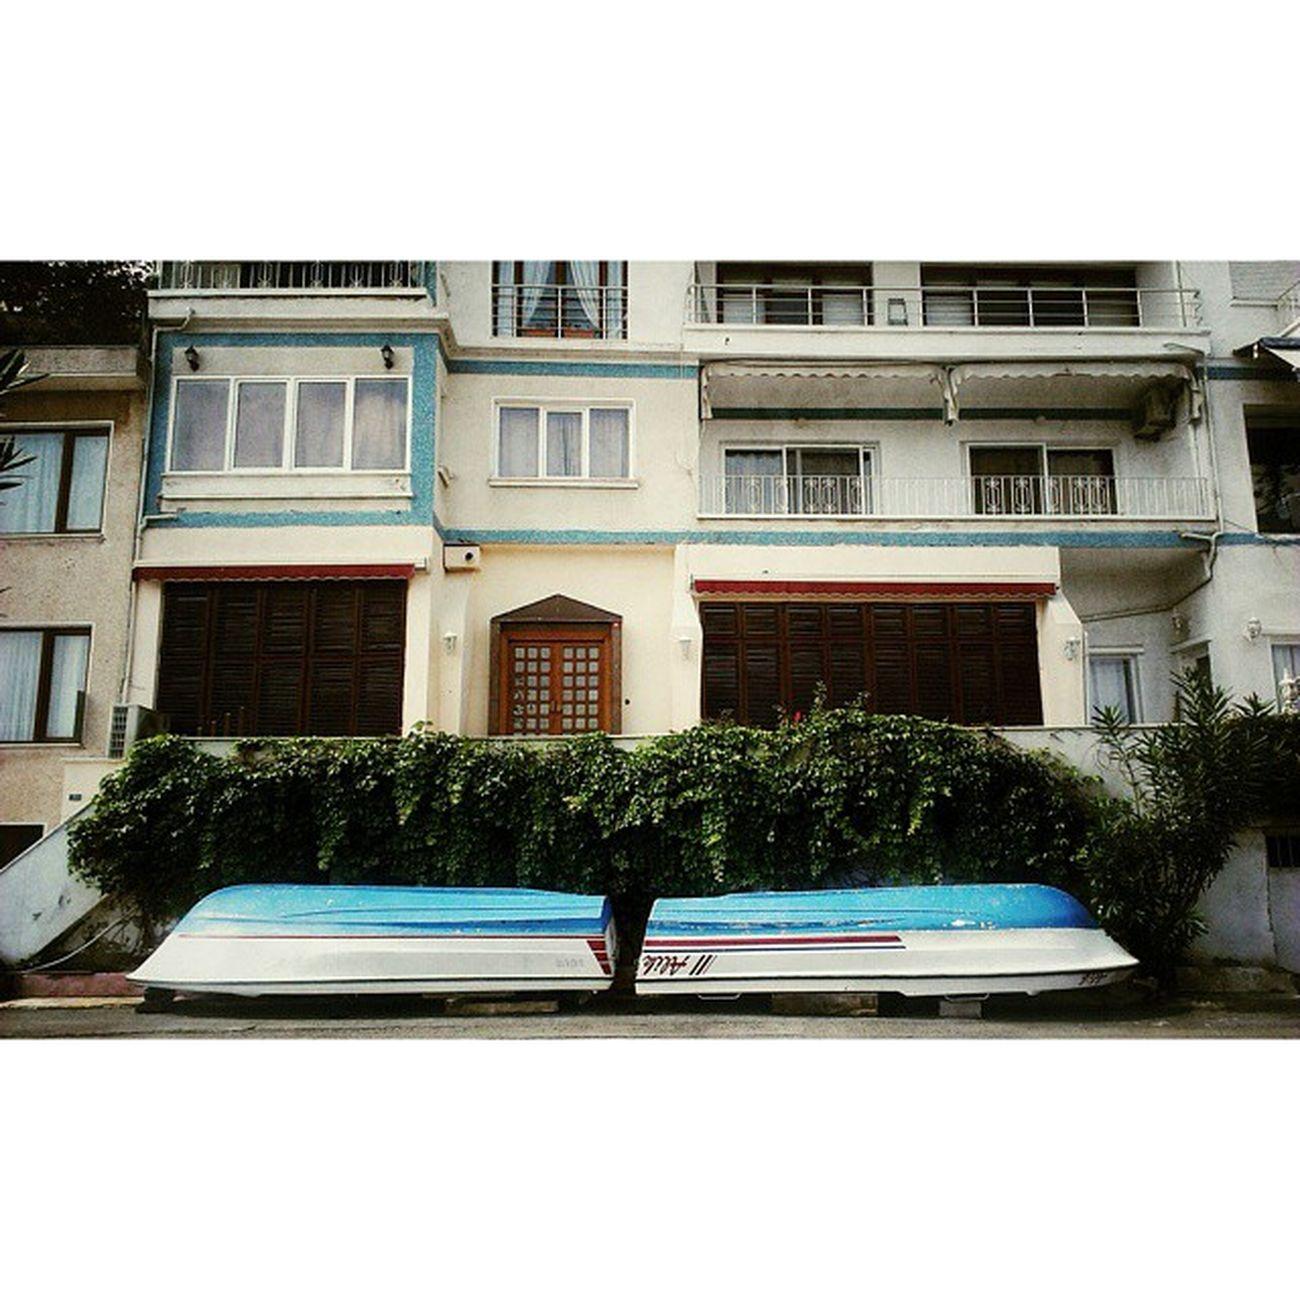 Insta Instagood Instamood VSCO Vscocam Vscomania Pictureoftheday Photooftheday Picoftheday Burgazada Istanbul